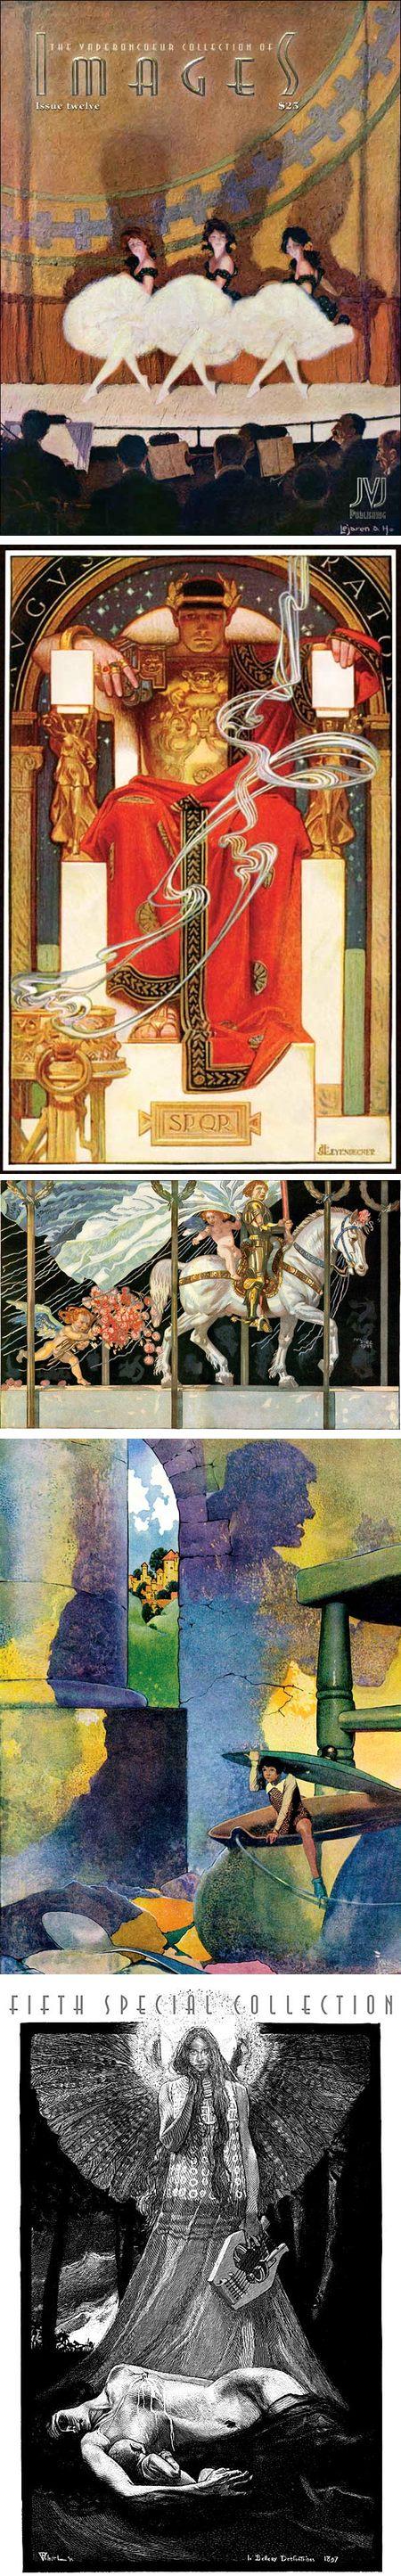 JVJ Publishing, ImageS magazine: Lejaren A. Hiller, J.C. Leyendecker, Julius Diez, Frank Godwin, Henri-Jules-Ferdinand Bellery-Desfontaines